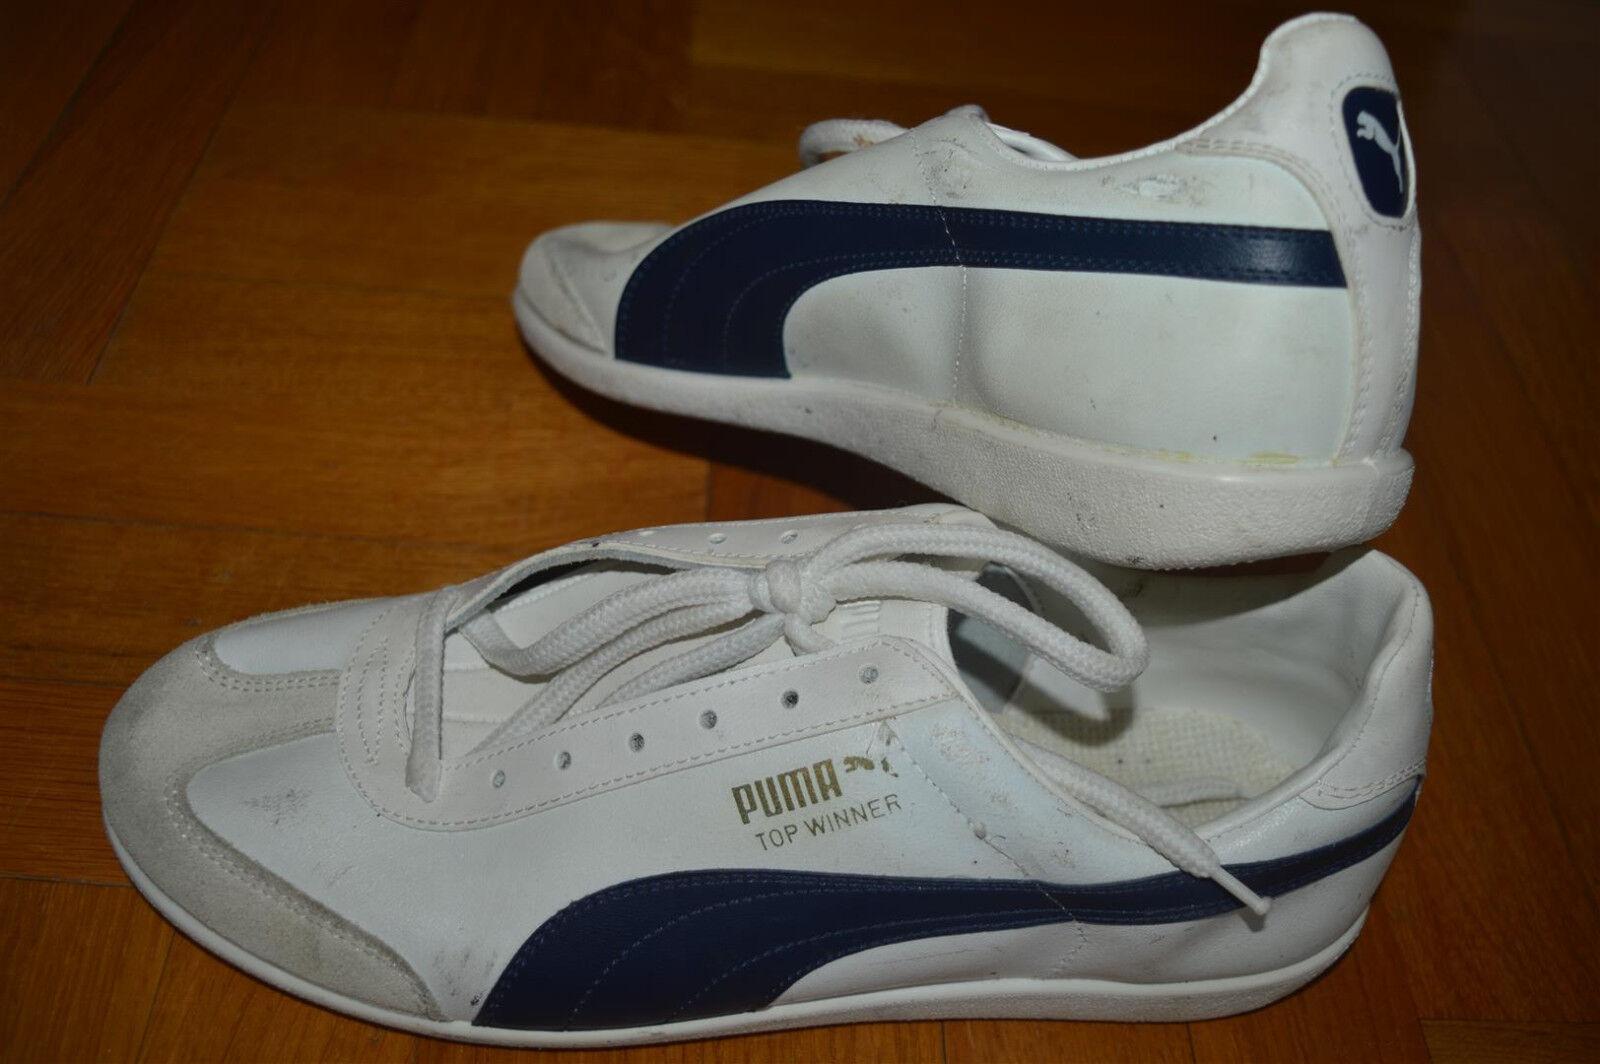 Vtg PUMA TOP WINNER Trainers  80s White White 80s Blue Uomo NOS Deadstock 7d13bc